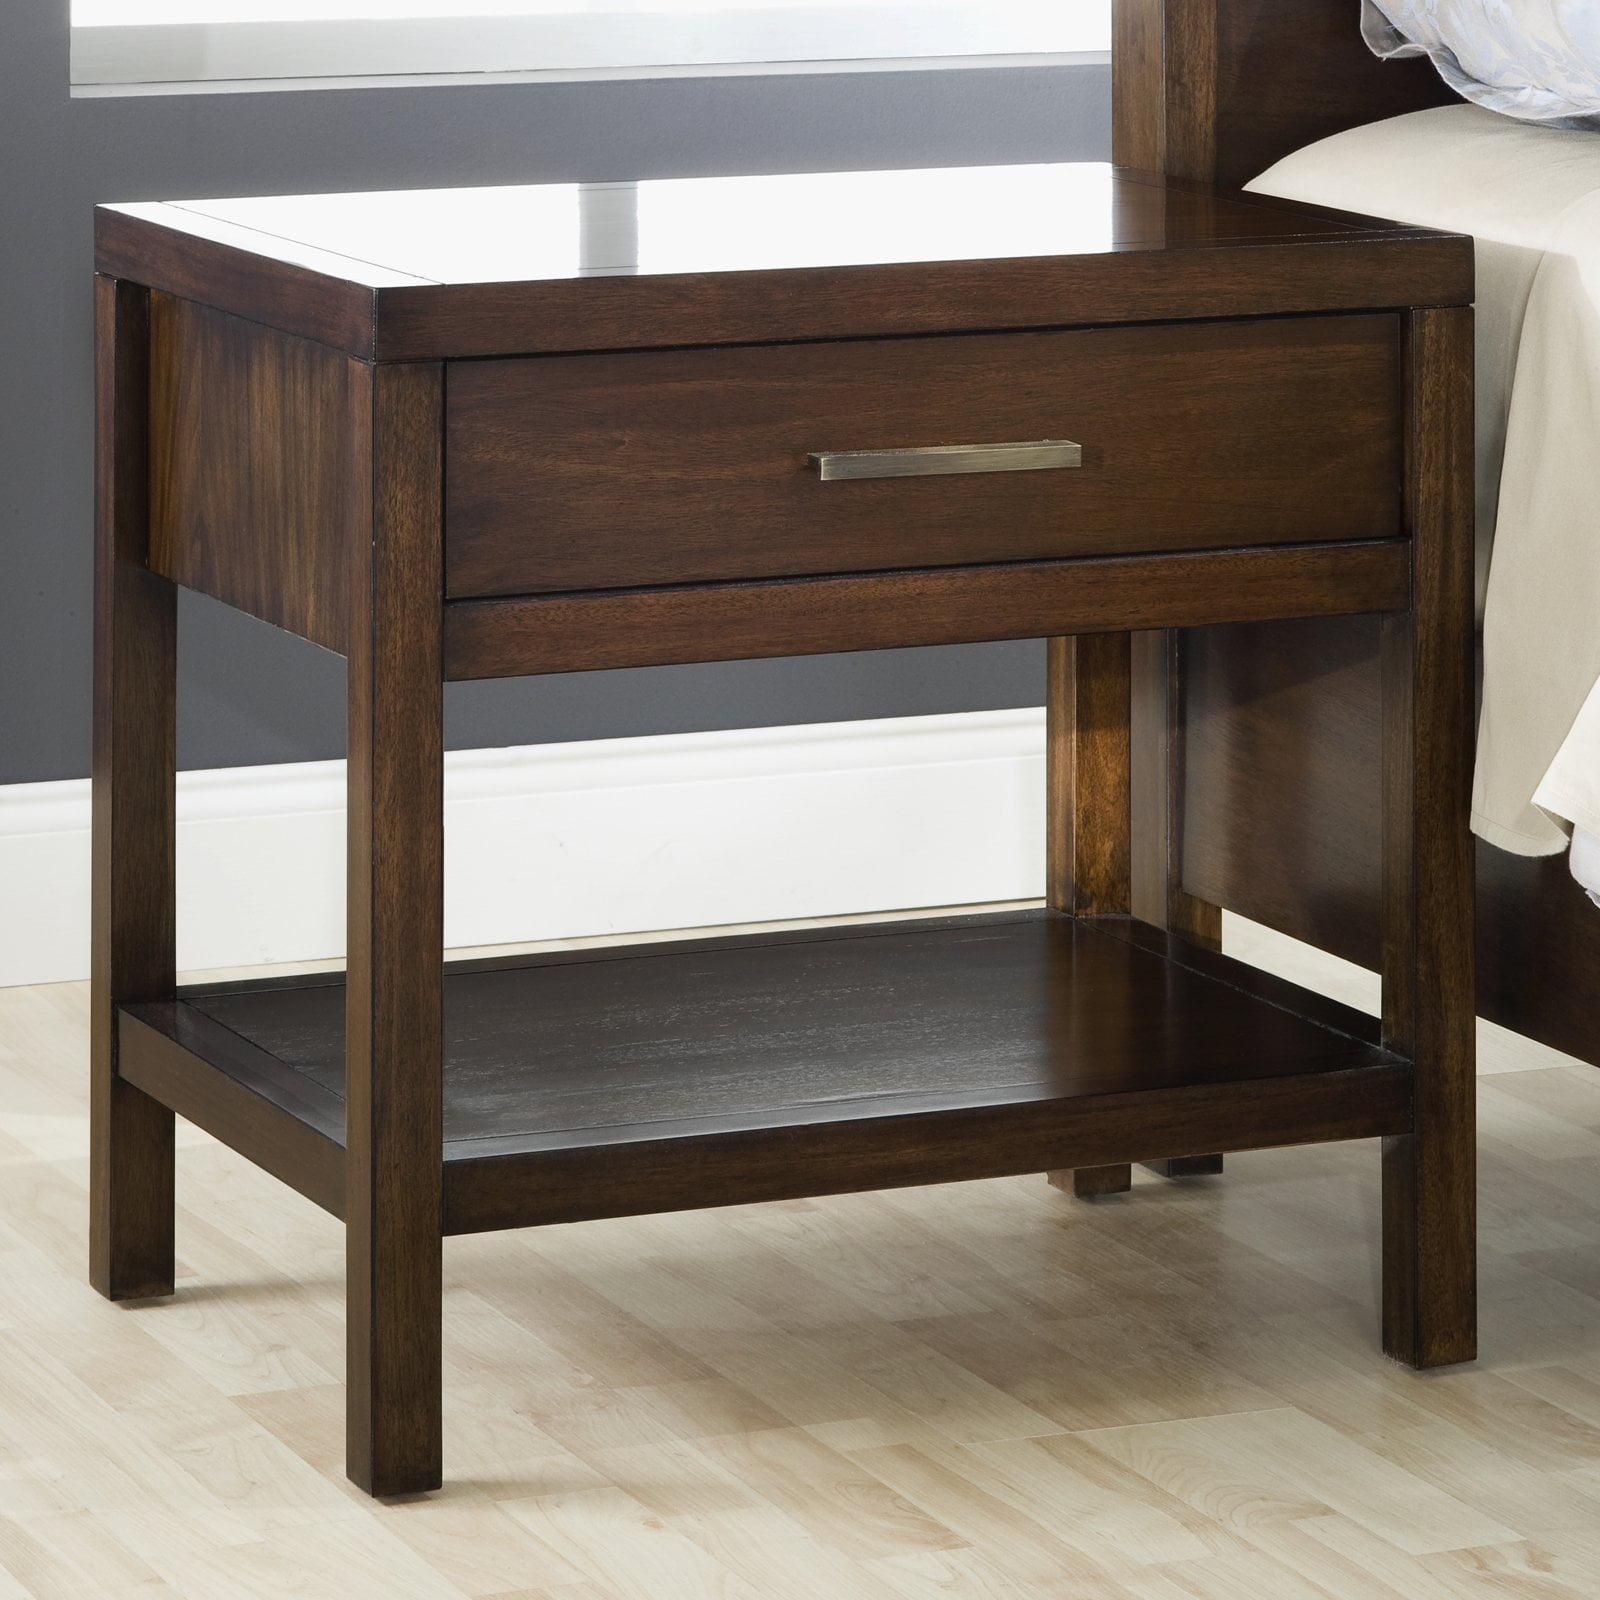 Modus Furniture Uptown 1-Drawer Nightstand, Truffle